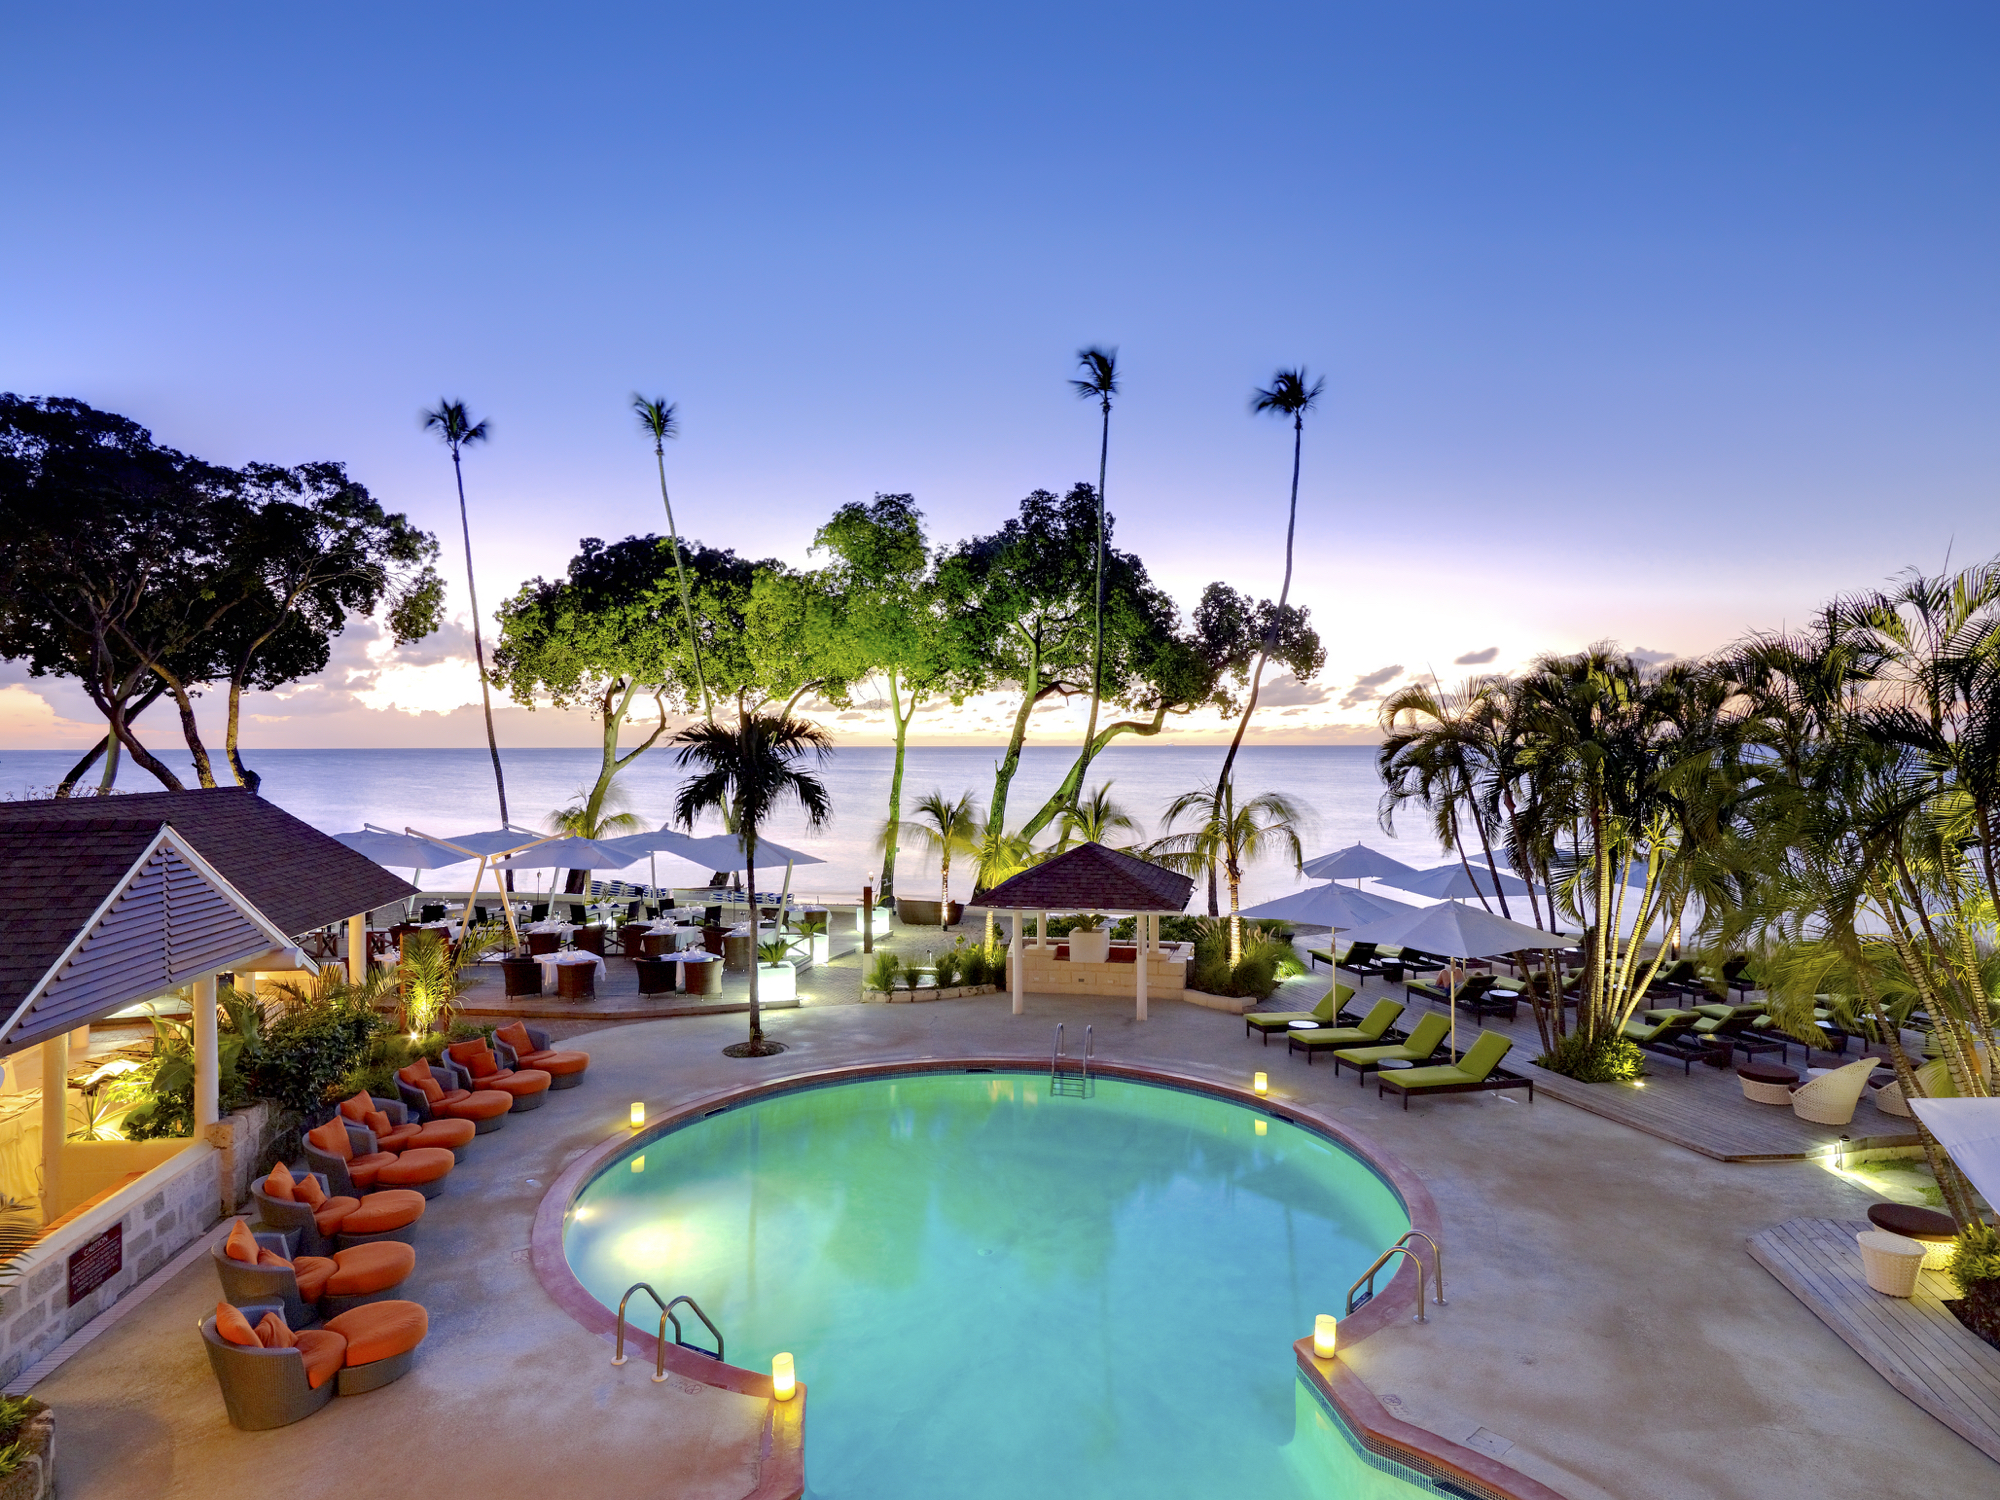 Great Black Friday Deals on Hotels Tamarind Barbados